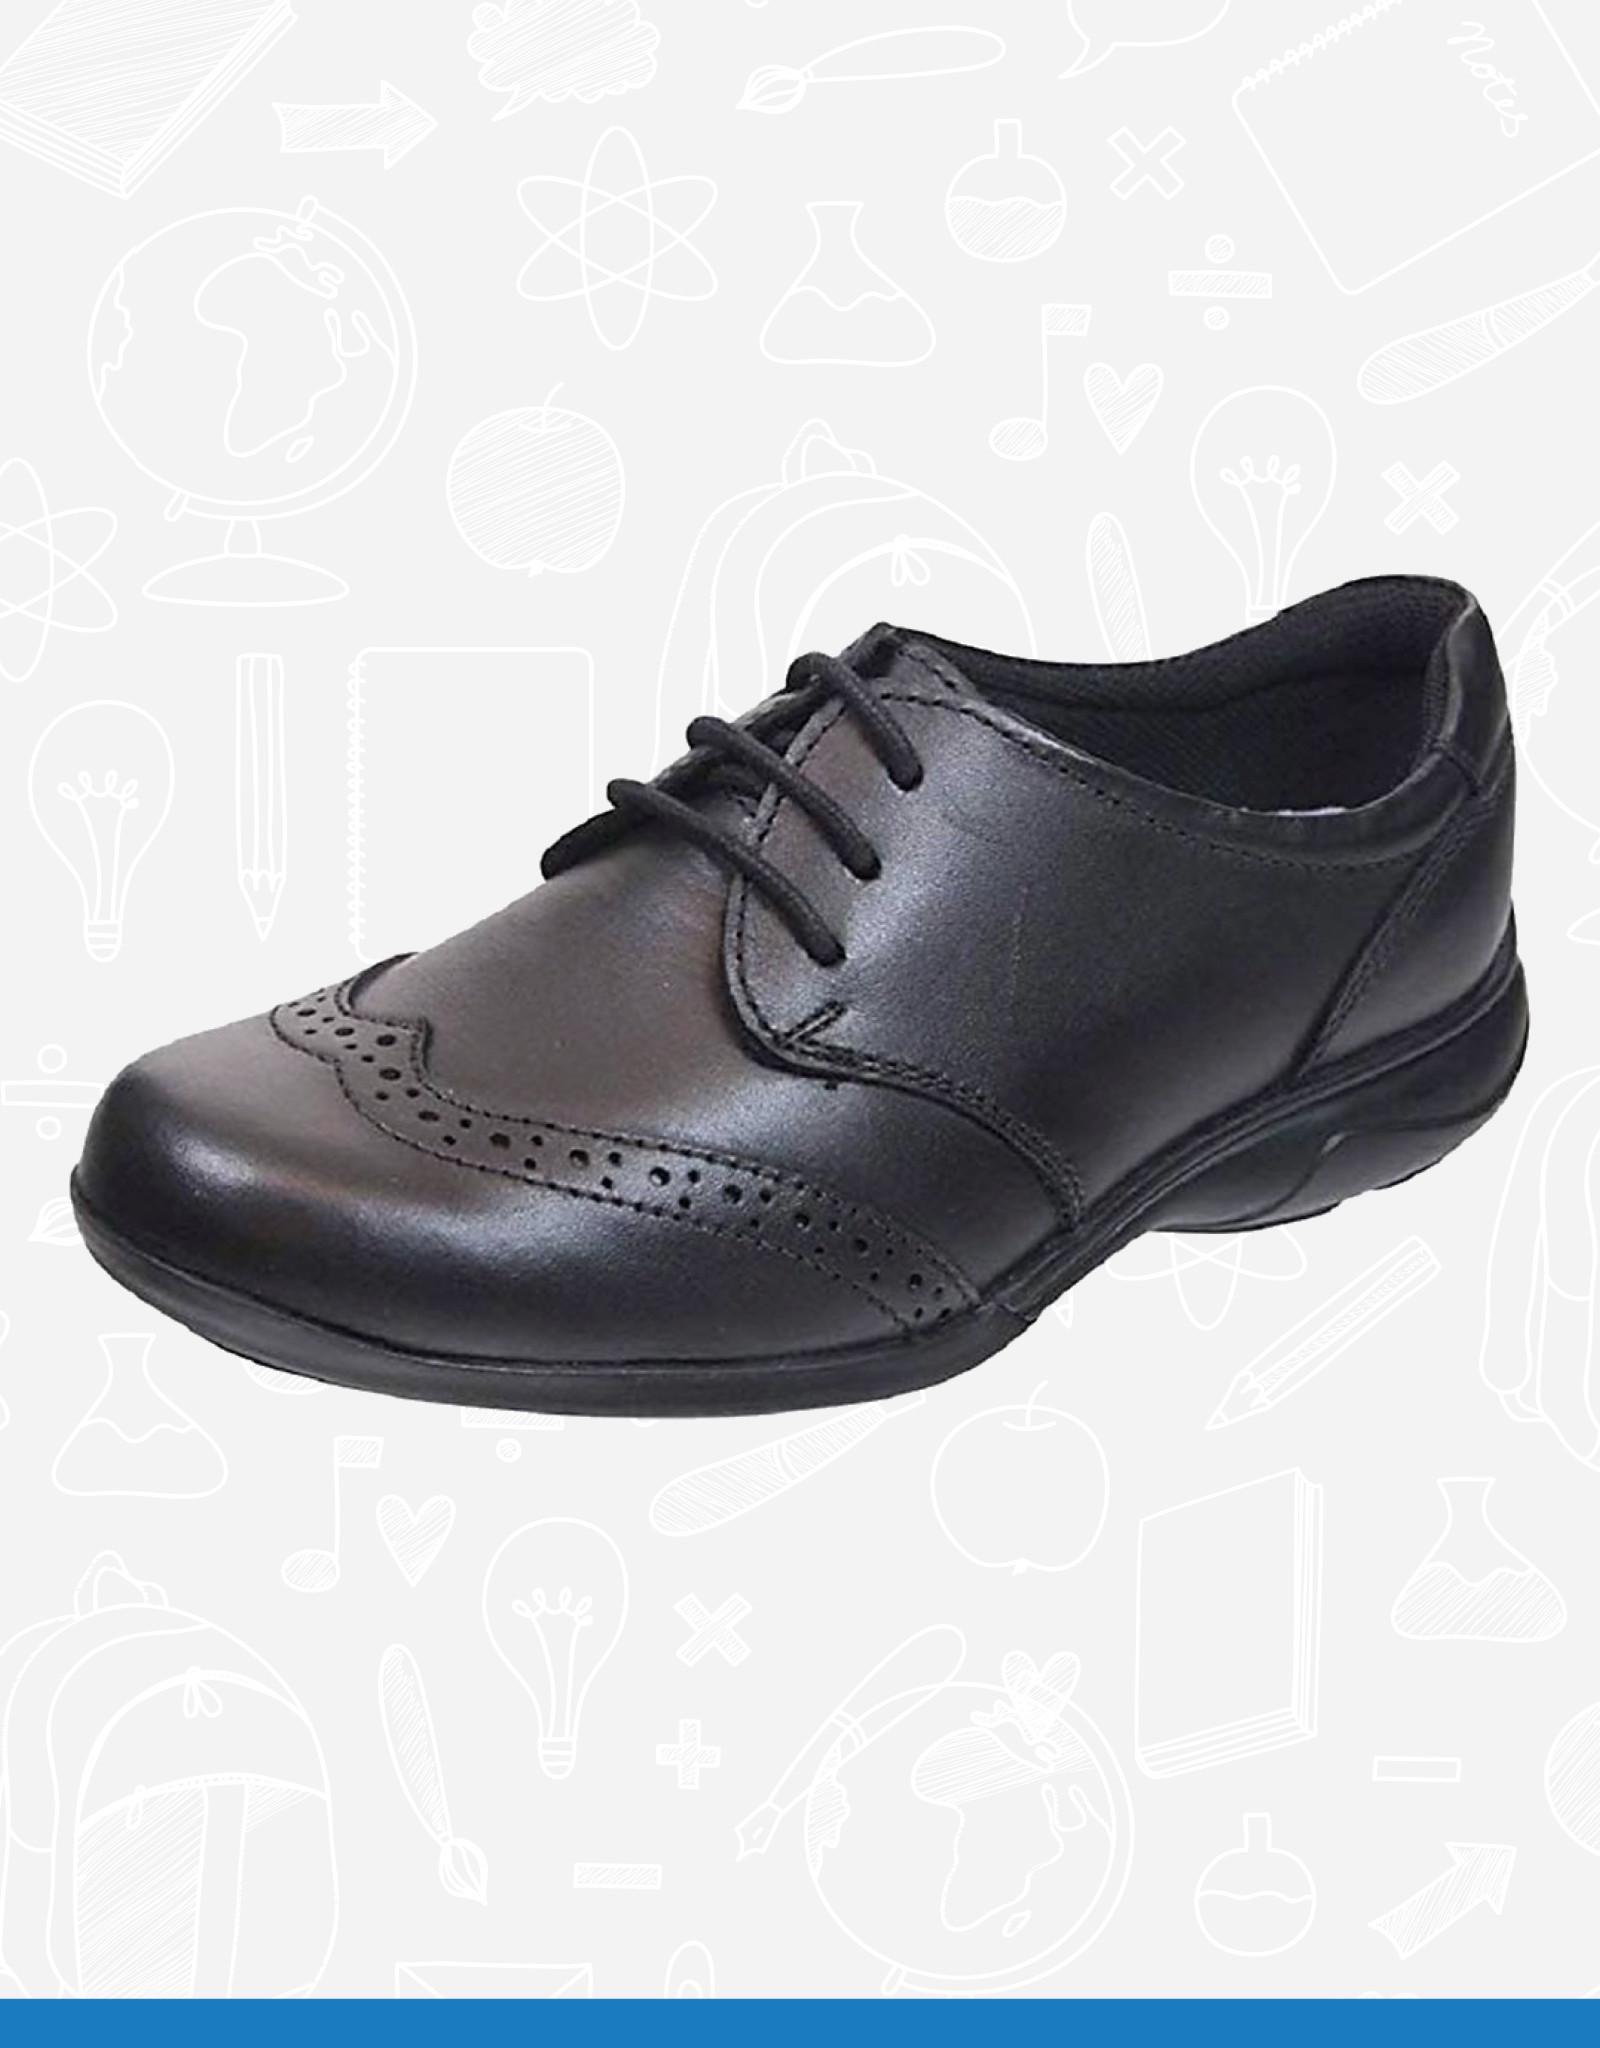 Term Summer Leather School Shoe